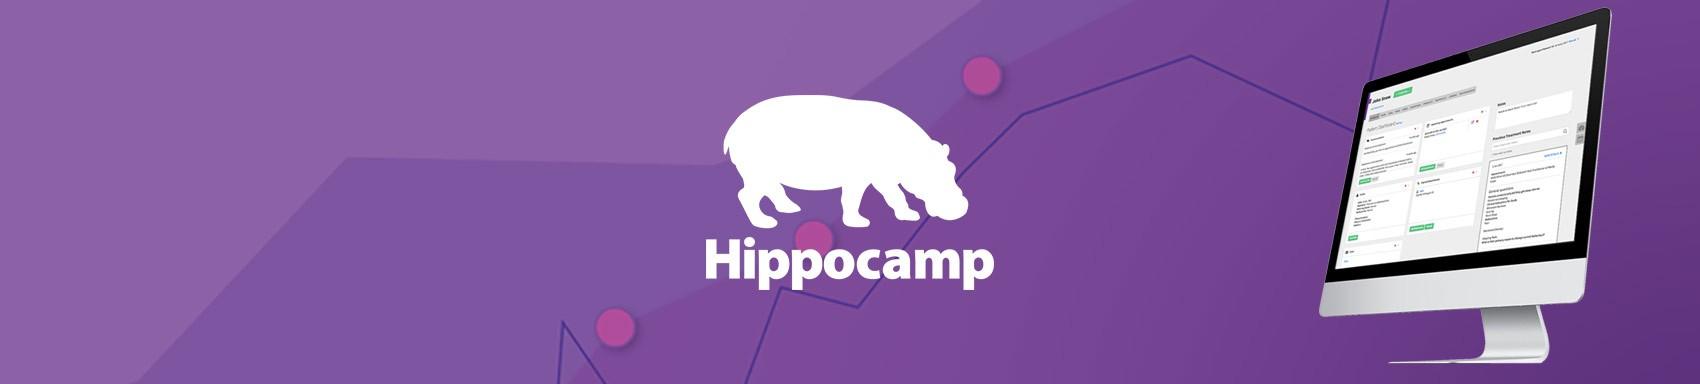 Hippocamp Practice Management System